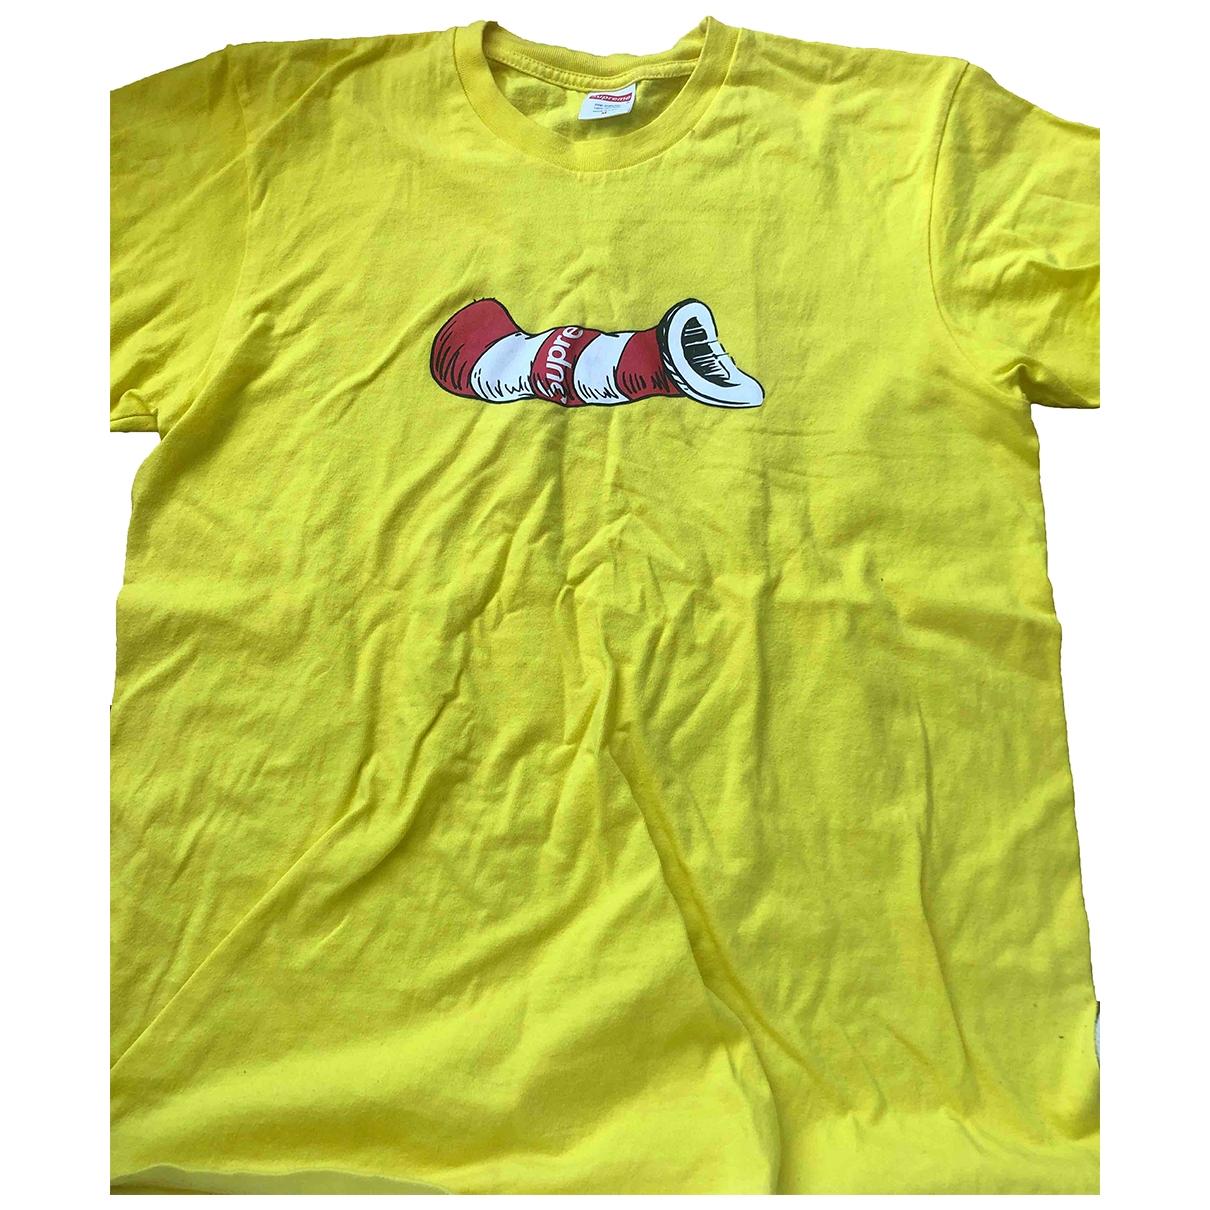 Supreme \N Yellow Cotton T-shirts for Men M International